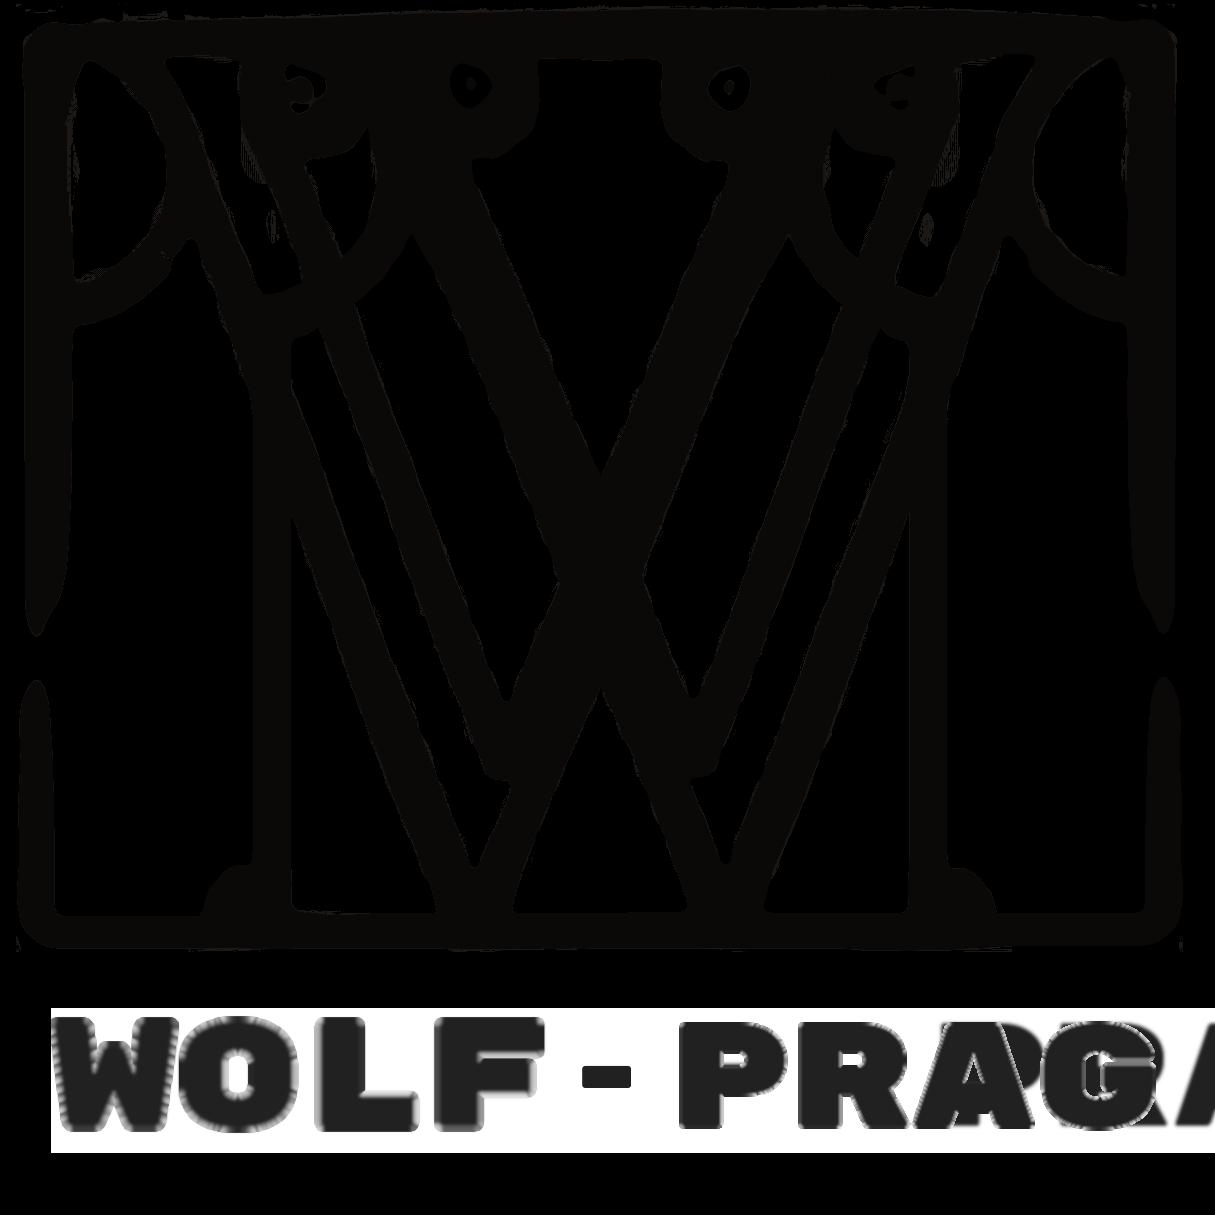 Nakladatelství Wolf Praha